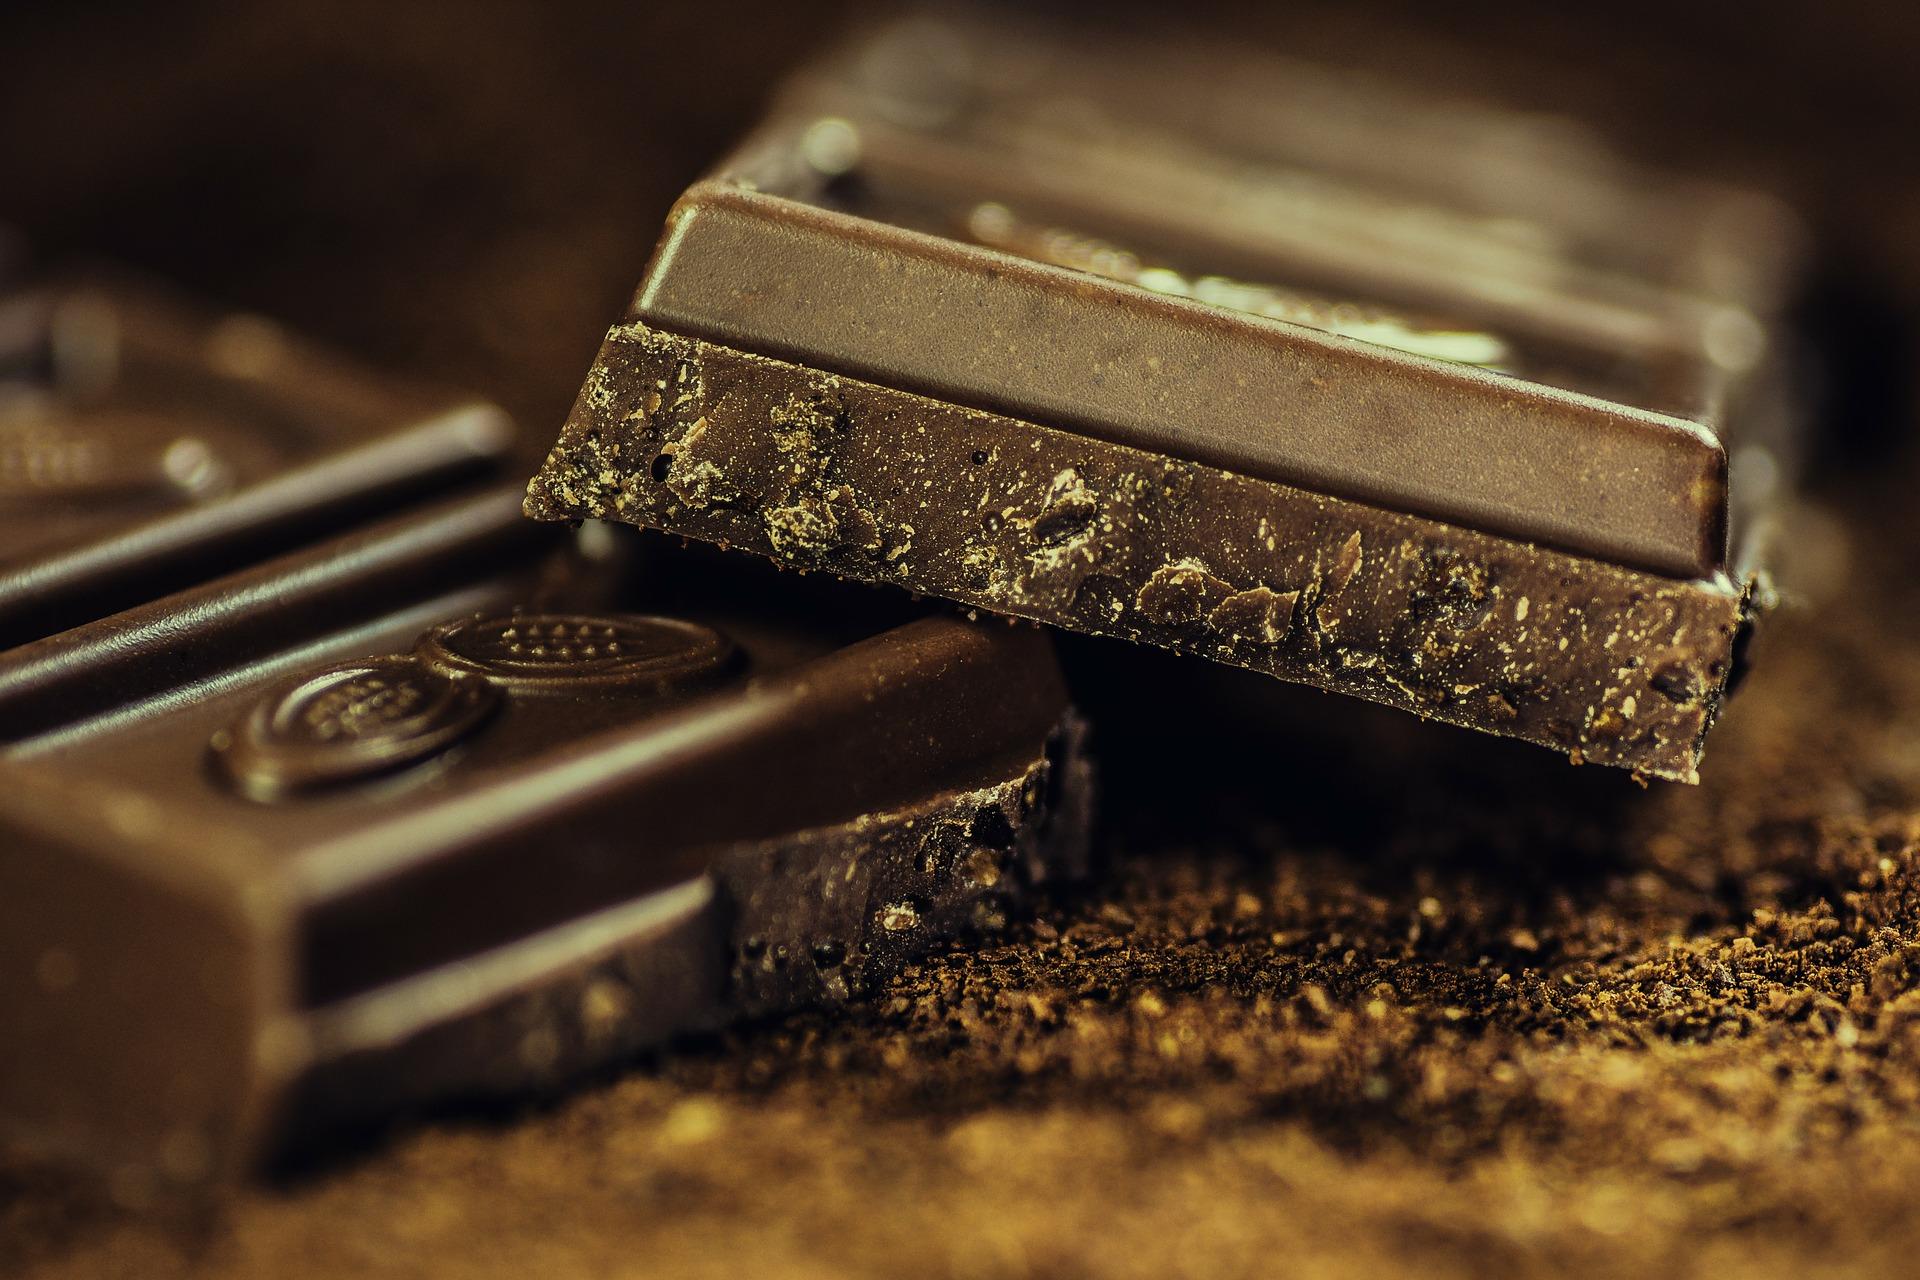 Laktosearme Schokolade (Zartbitter)